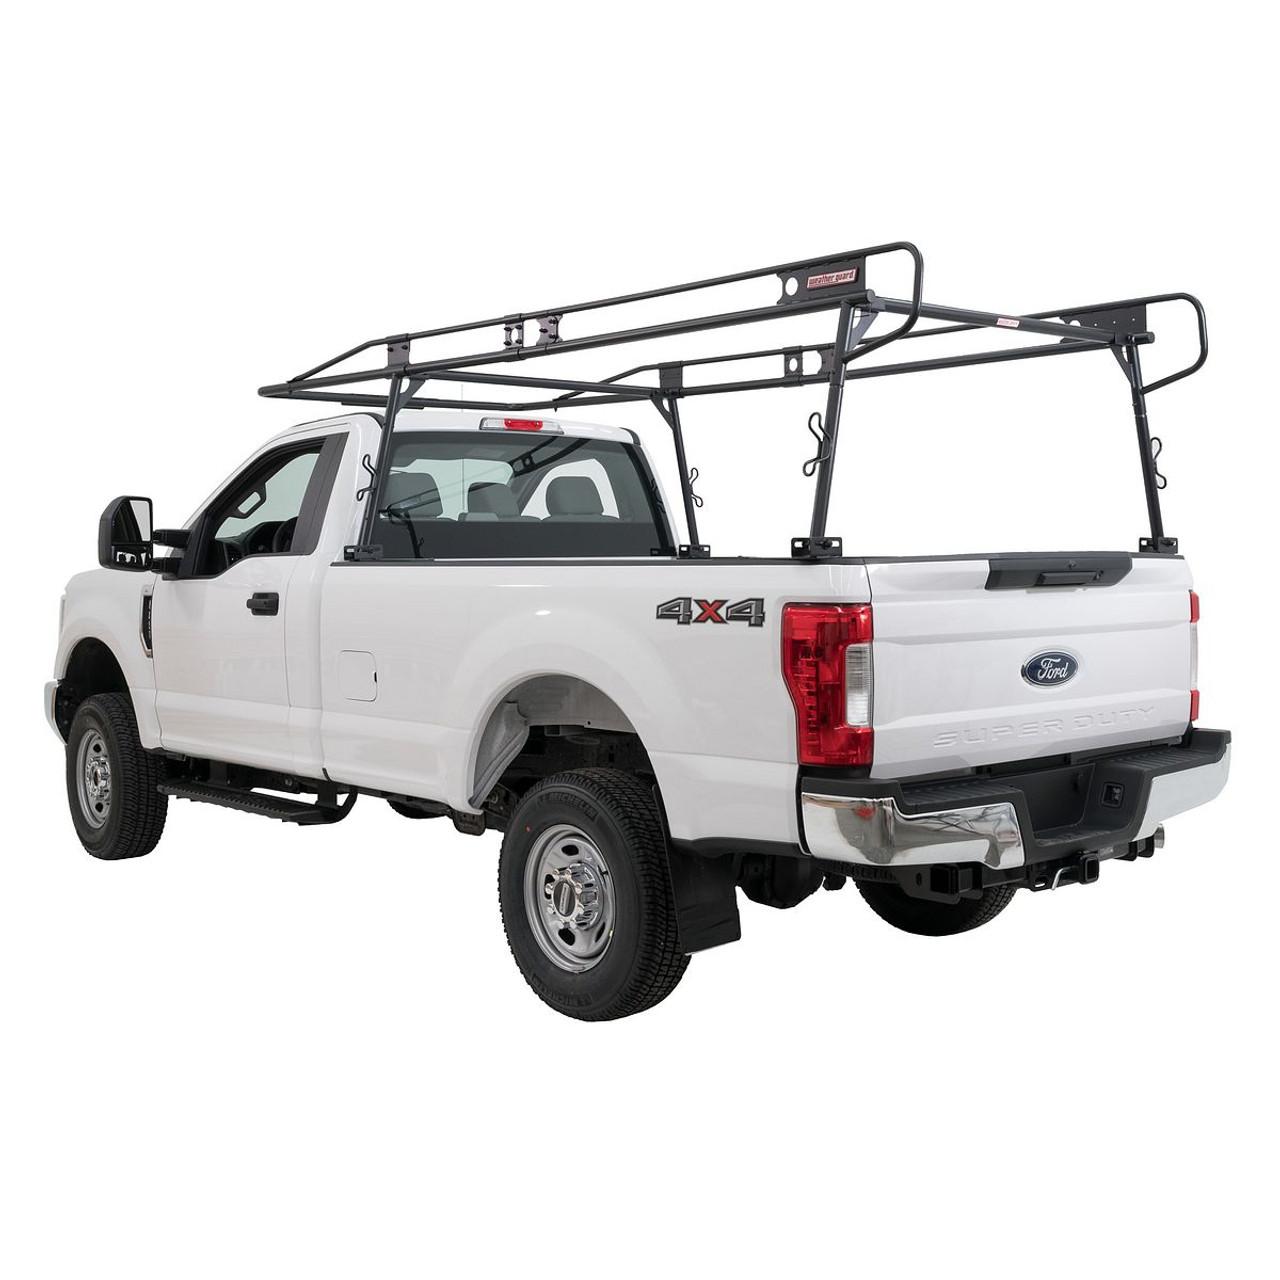 https leonardaccessories com product racks ladder racks weatherguard steel ladder rack system